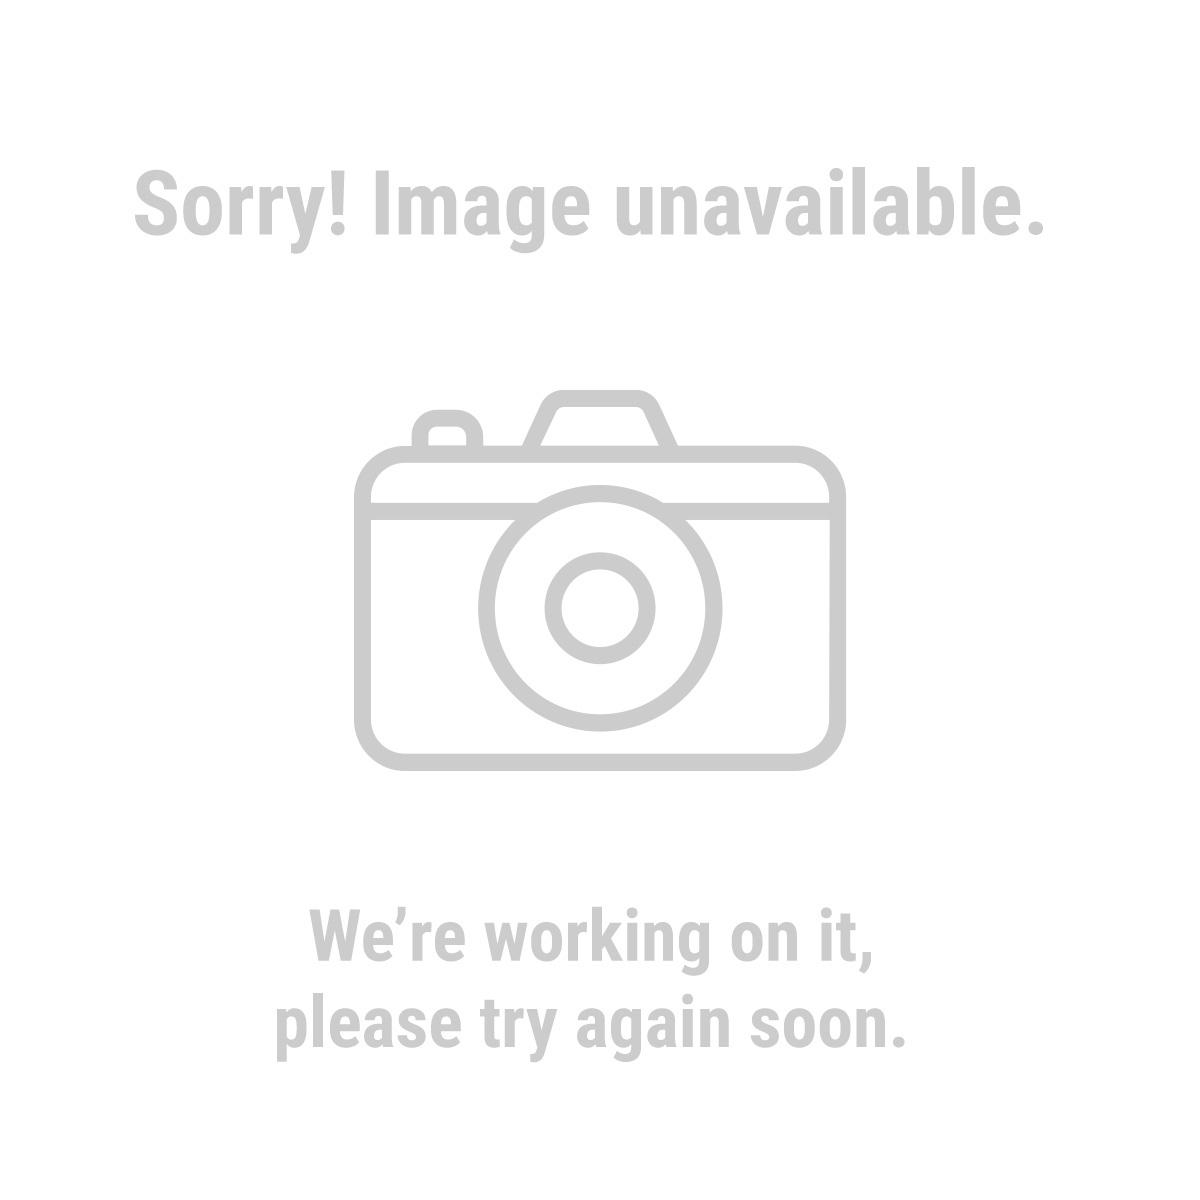 Rust-Oleum 67970 Rust-Oleum Rust Reformer Spray